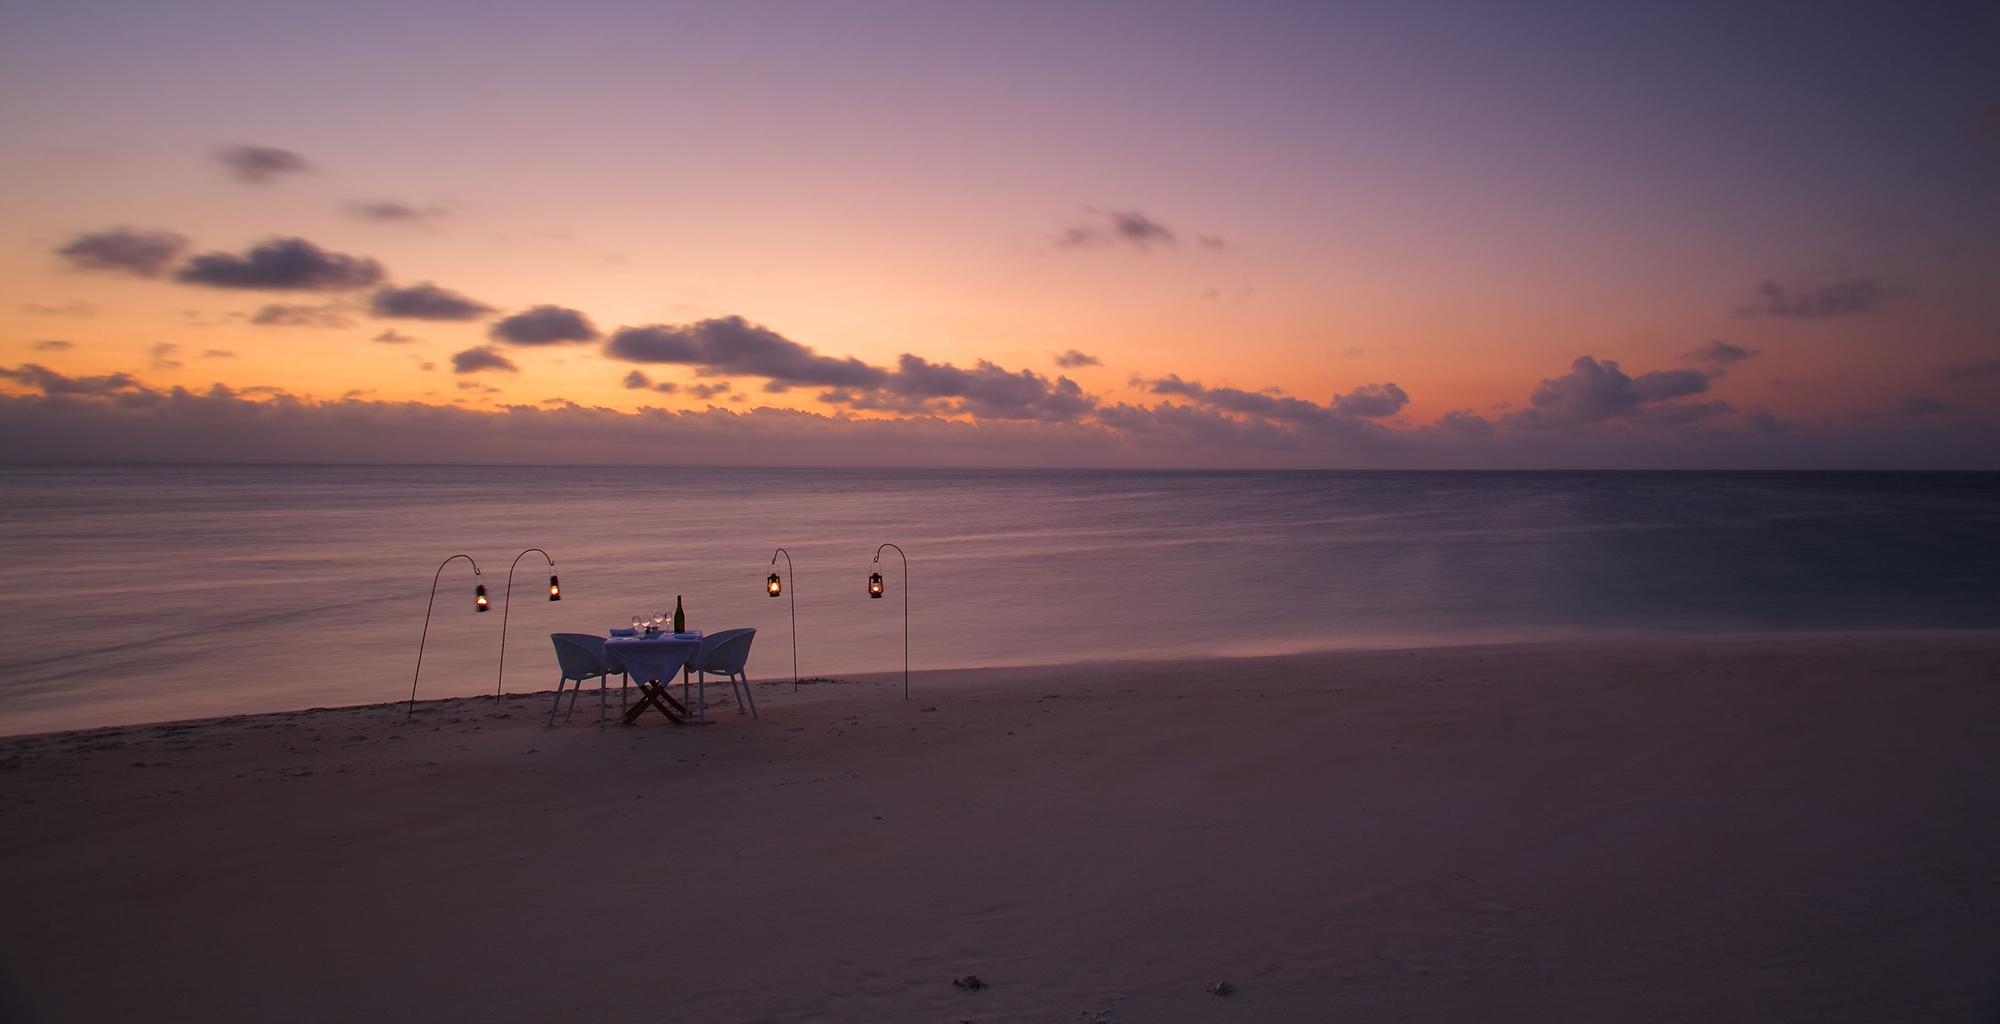 Mozambique-Bazaruto-Archipelago-Azura-Benguerra-Private-Dining